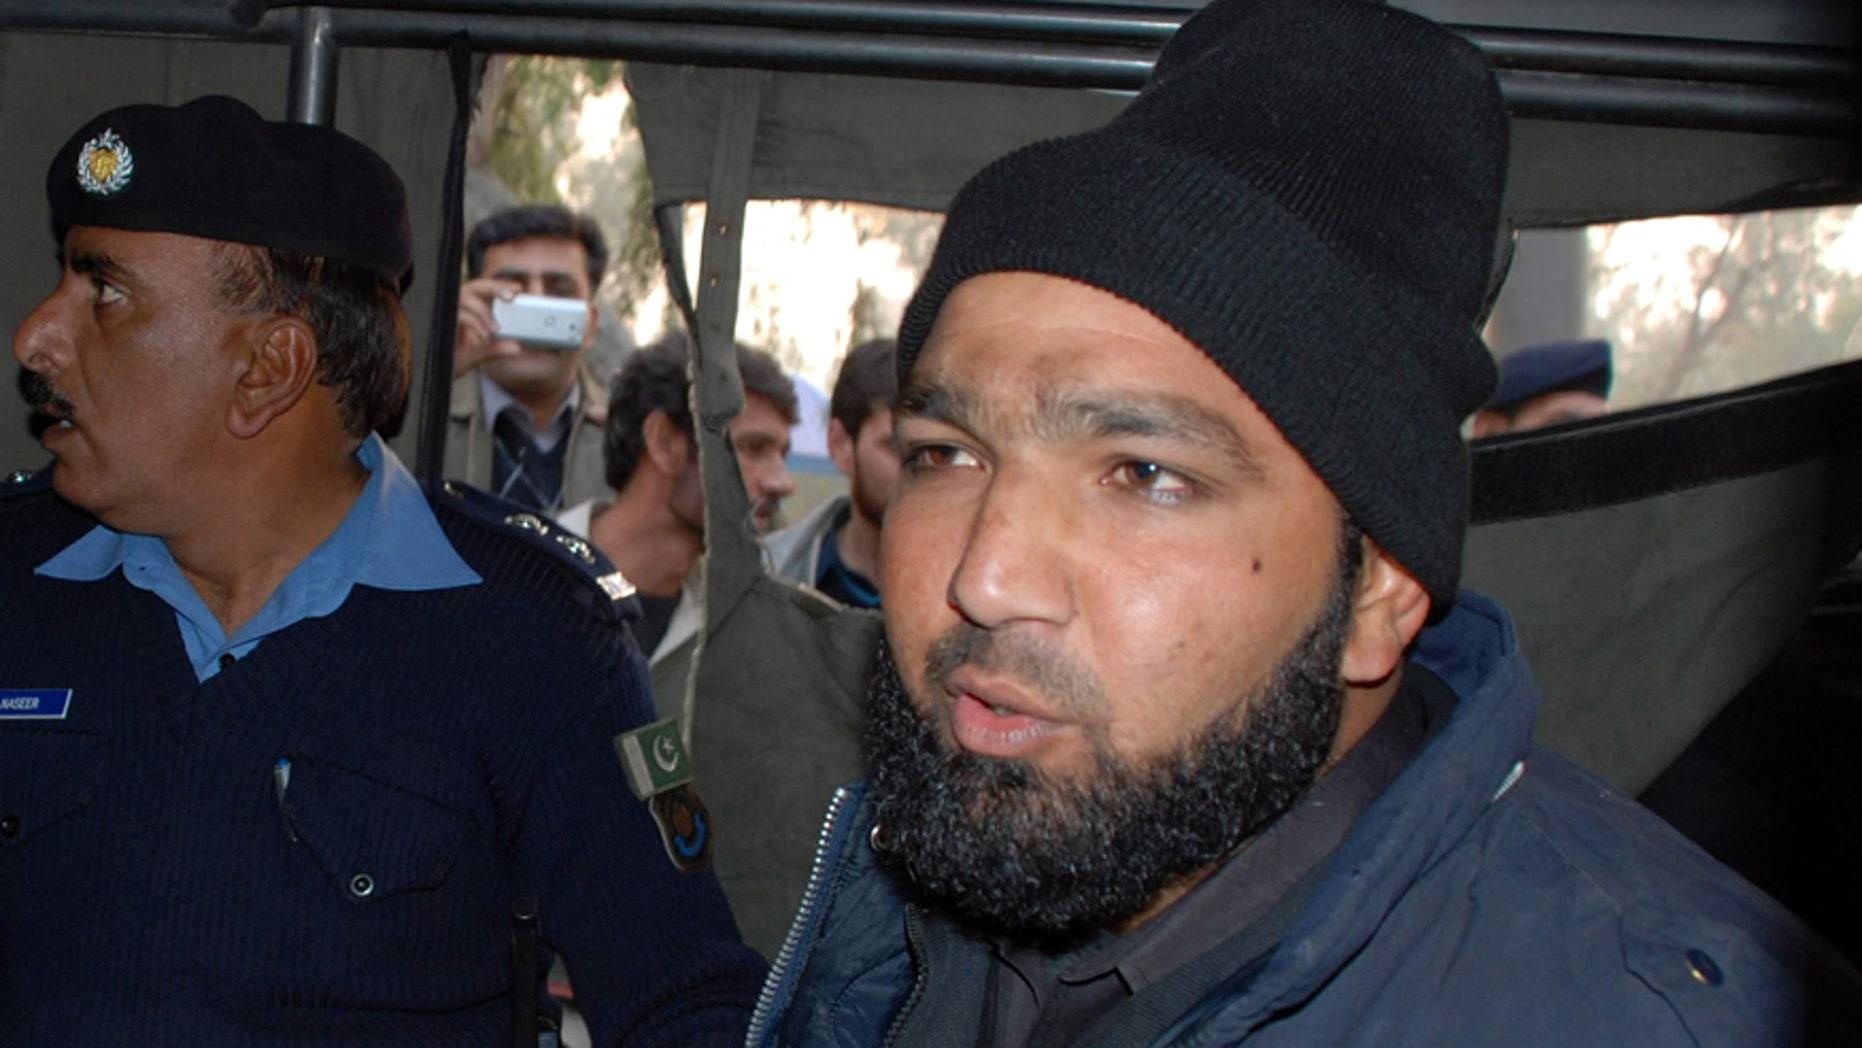 Jan. 4, 2011: Commando of Pakistan's Elite force Mumtaz Qadri, right, who killed Punjab's Gov. Salman Taseer, sits in police custody in Islamabad, Pakistan.